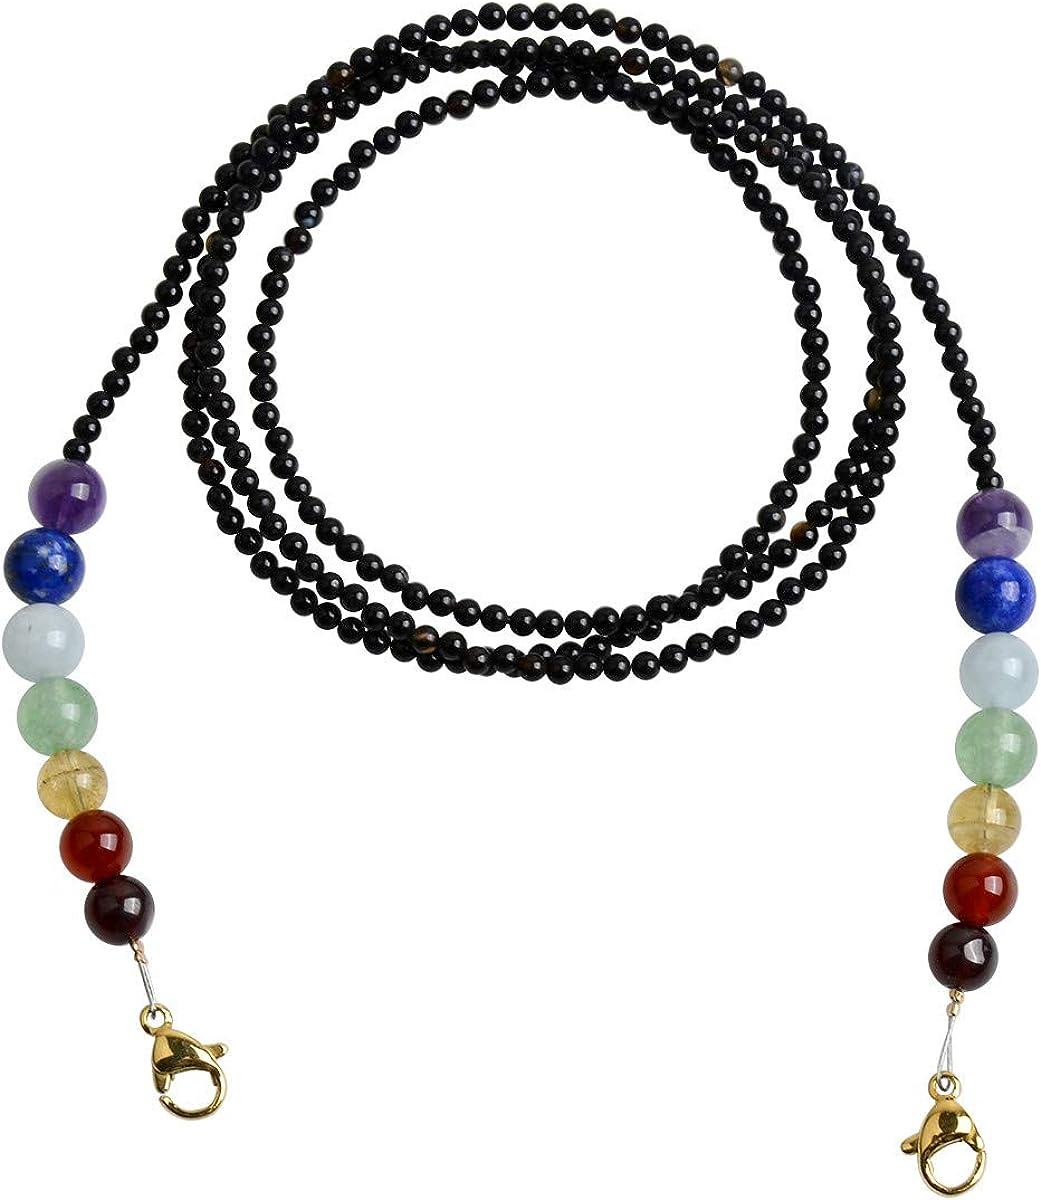 Qordelia Natural Black Onyx with 7 Kinds Natural Gem 7 Chakras Bead Necklace Bracelet Eyeglass Chains for Kids Women Men